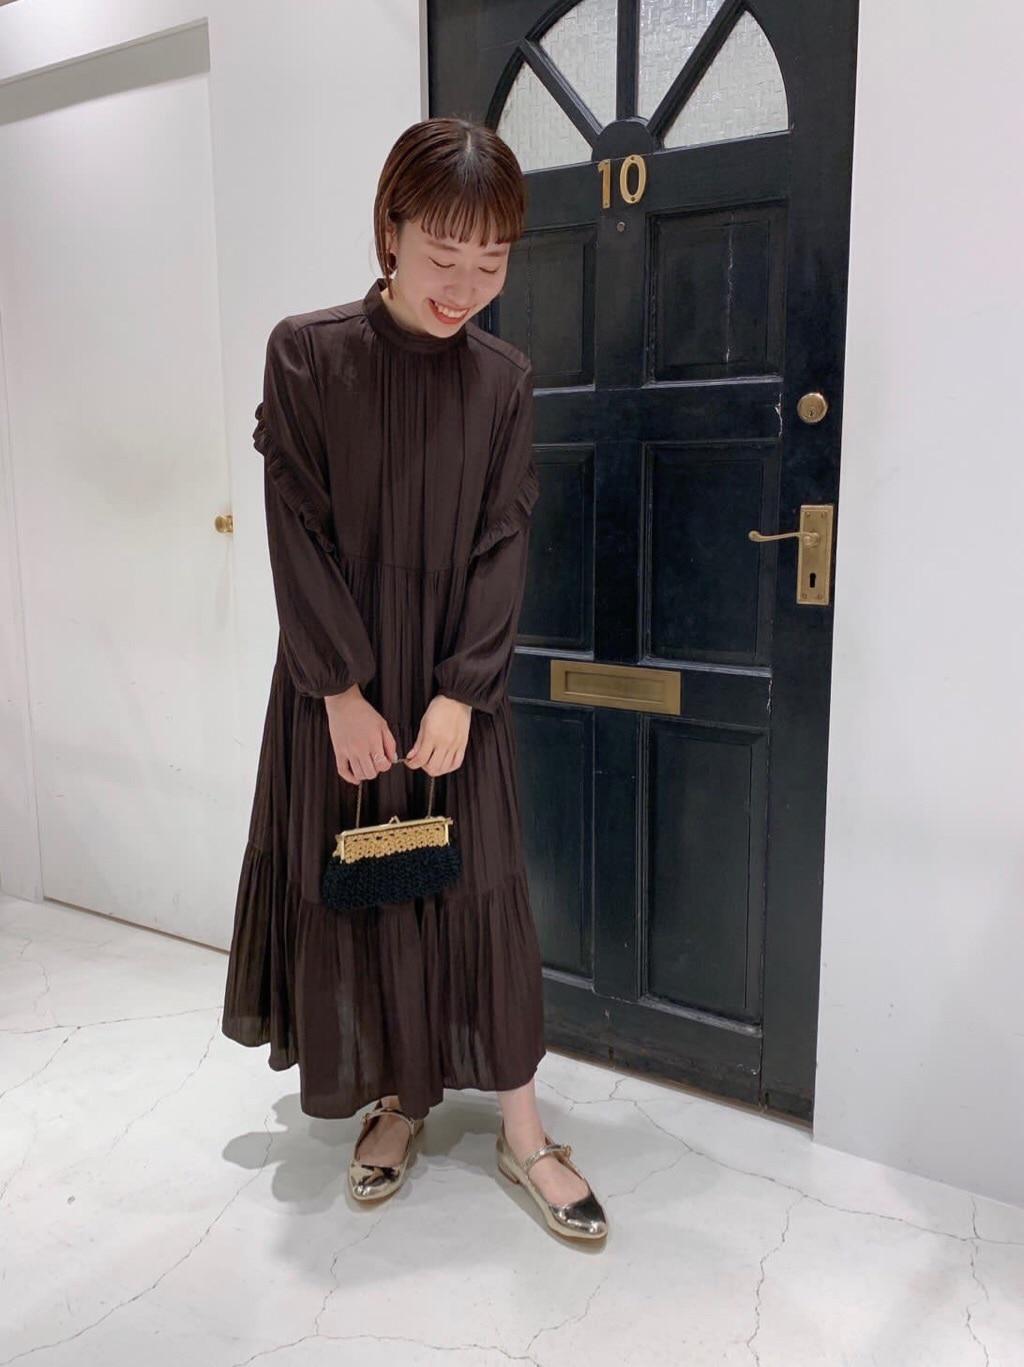 Dot and Stripes CHILD WOMAN ルクアイーレ 身長:157cm 2019.10.10